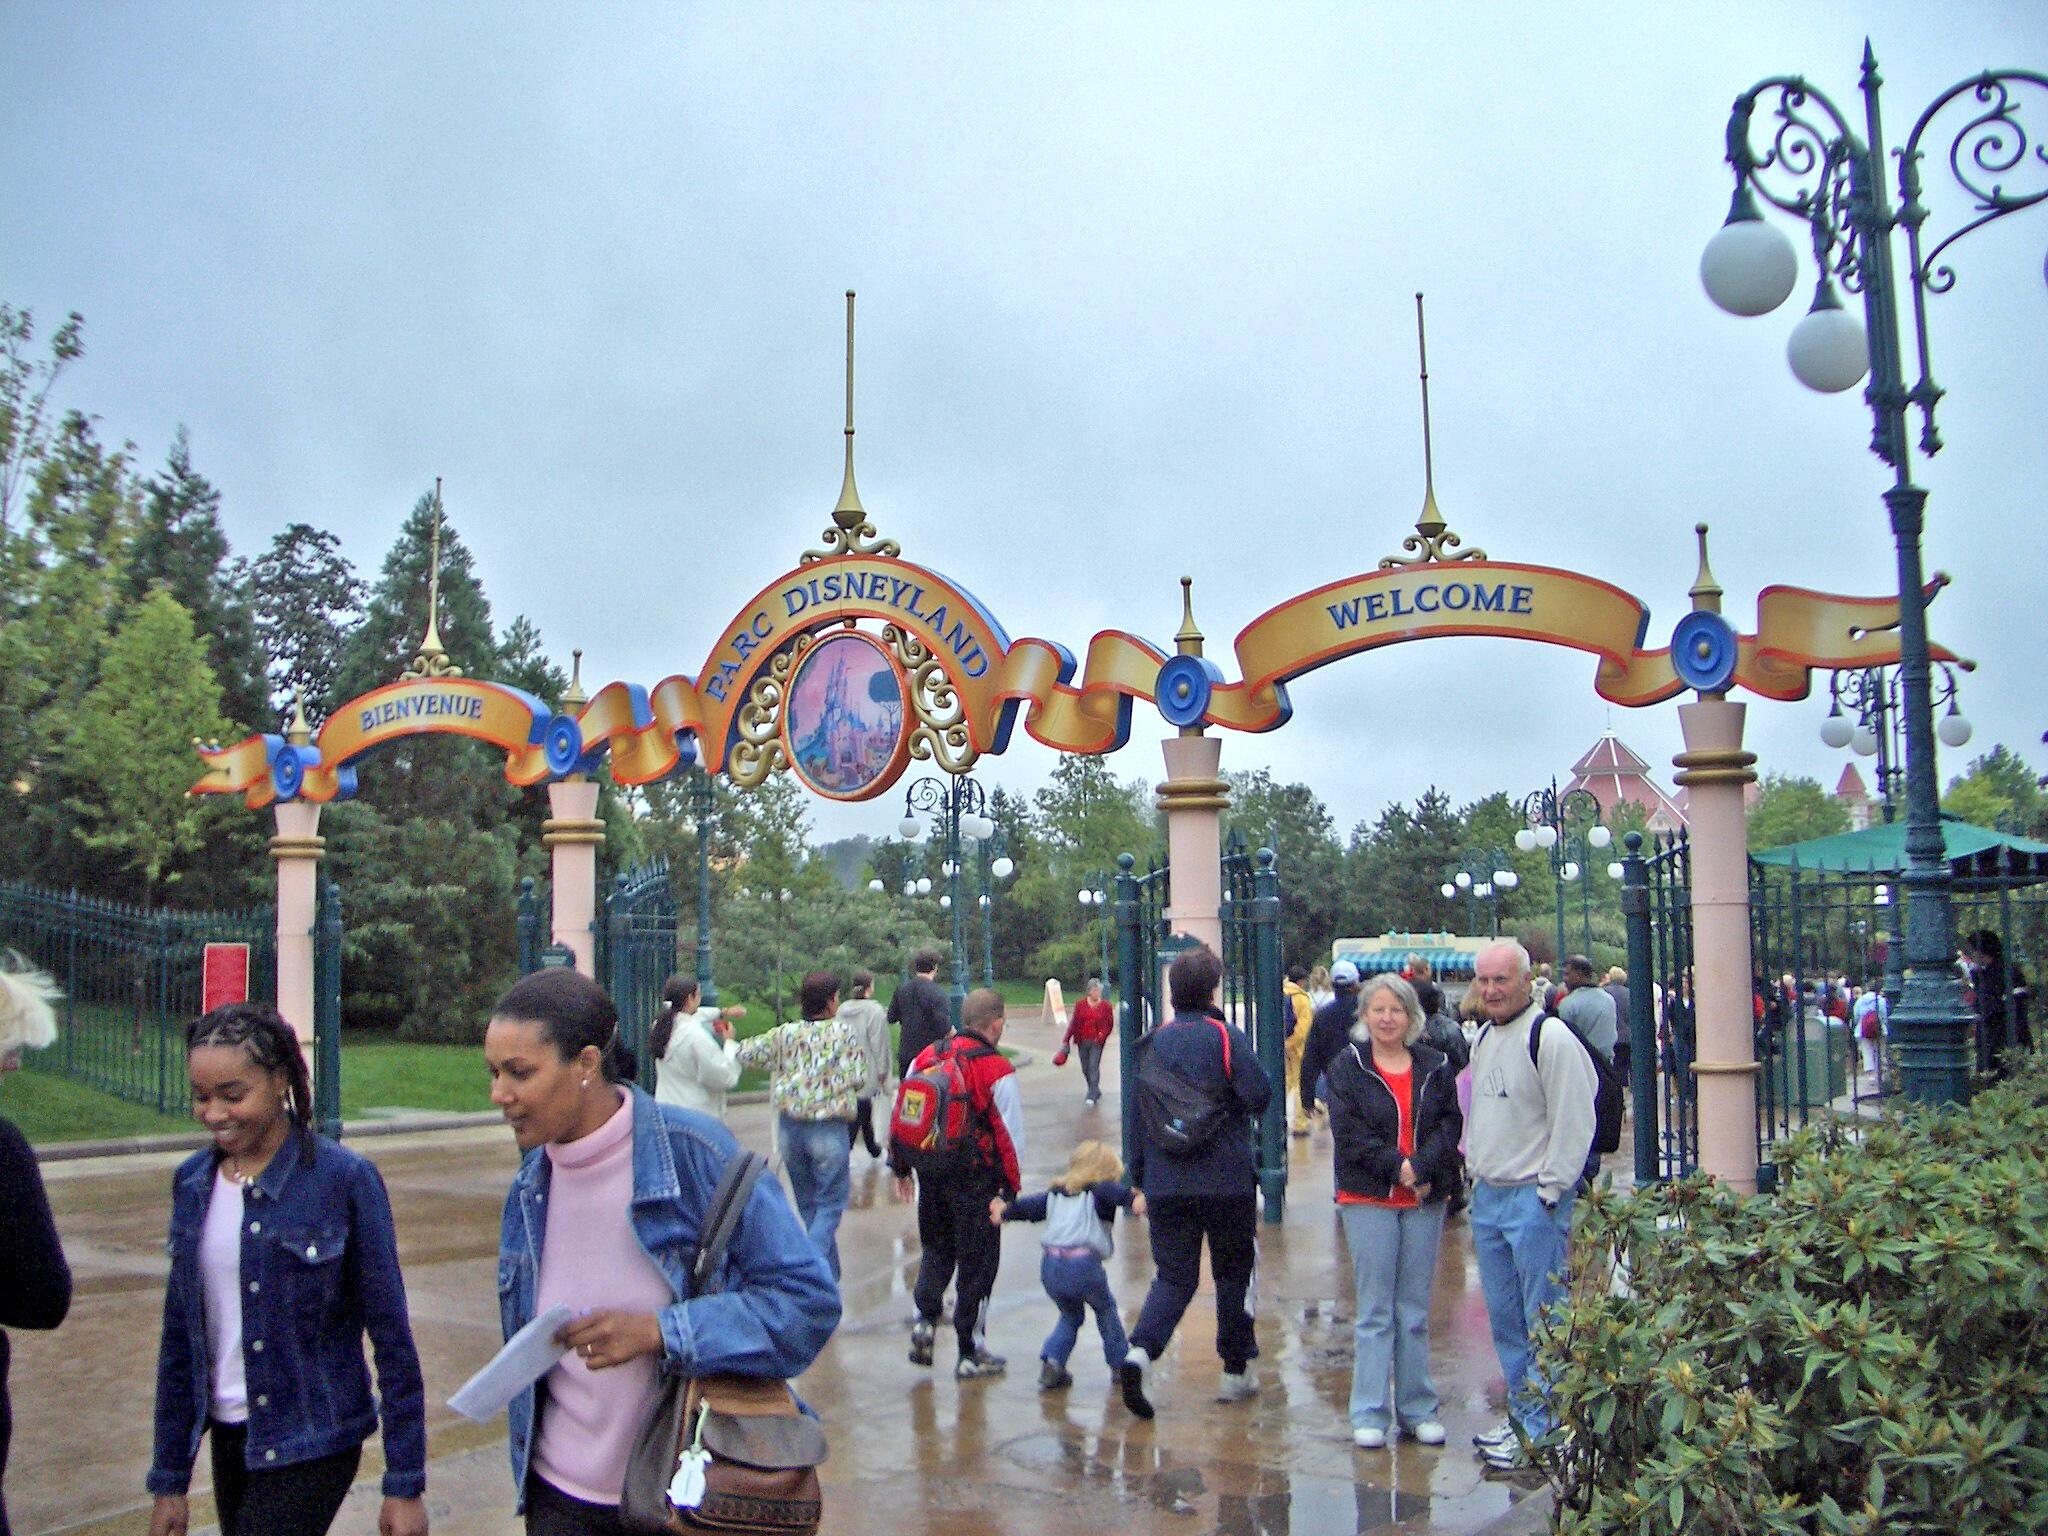 Disneyland paris disney parks wiki fandom powered by wikia disneyland paris publicscrutiny Choice Image